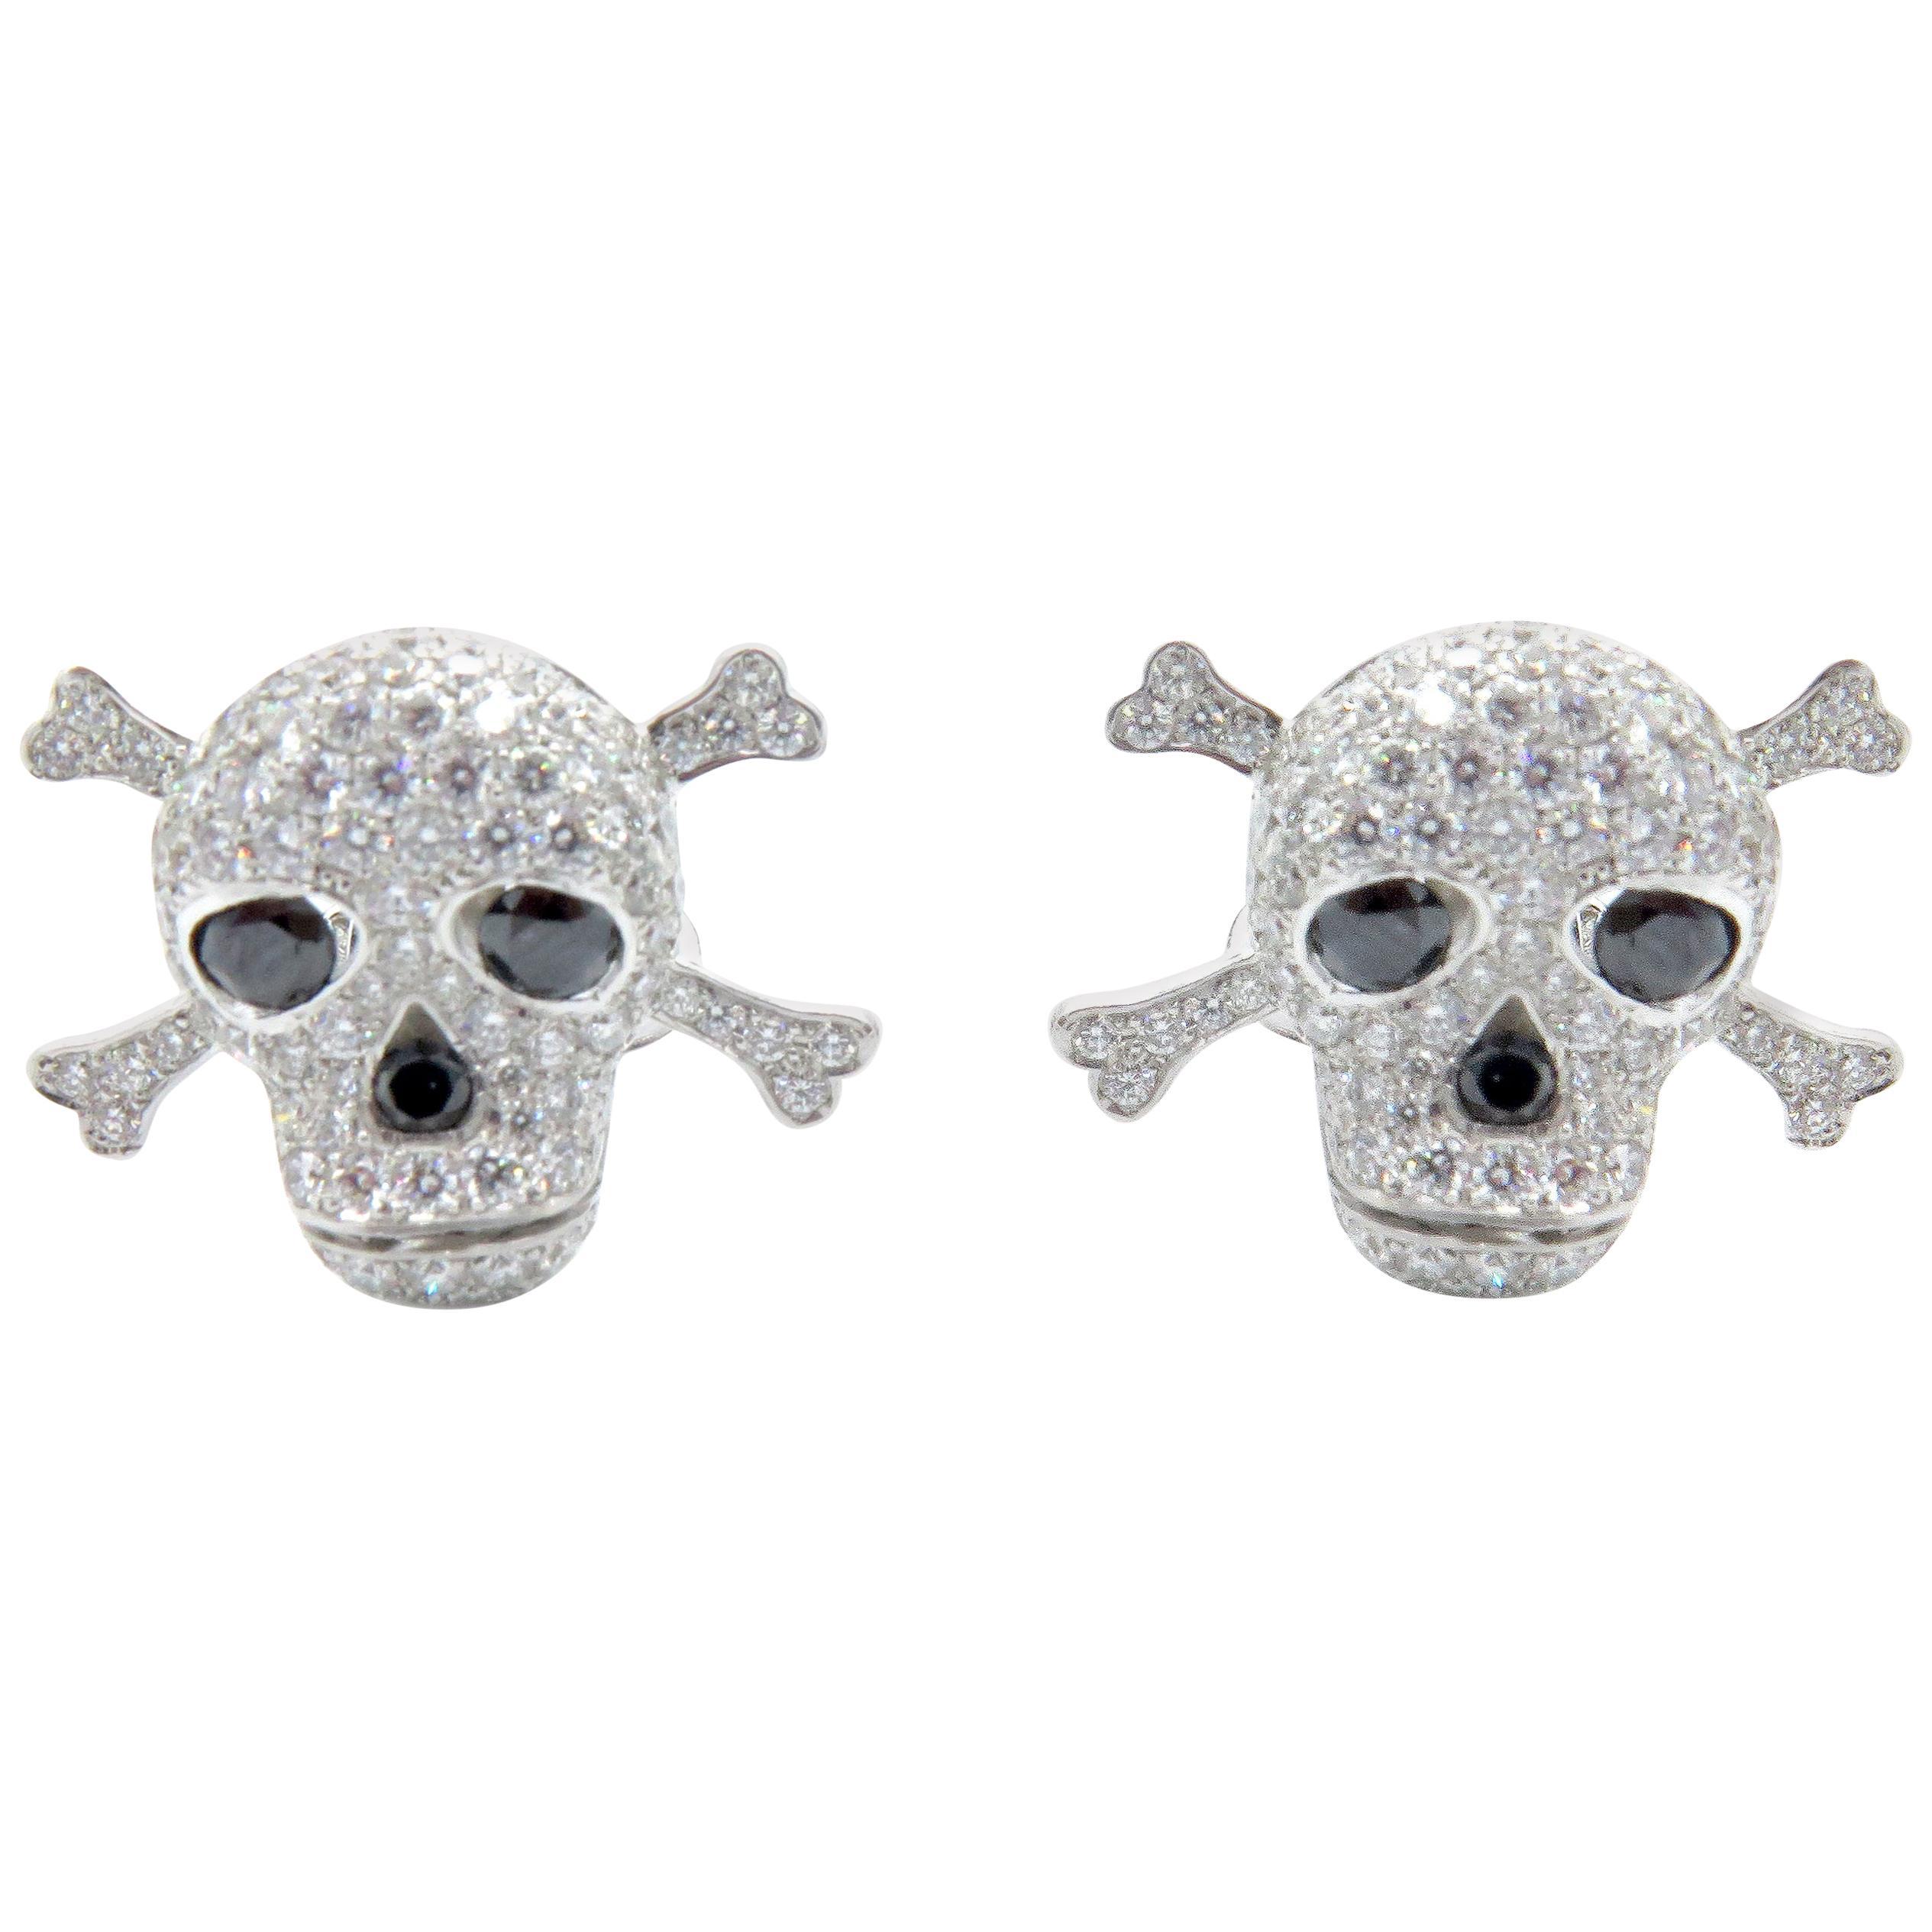 CPN 18 Karat White Gold Diamond Skull Cufflinks